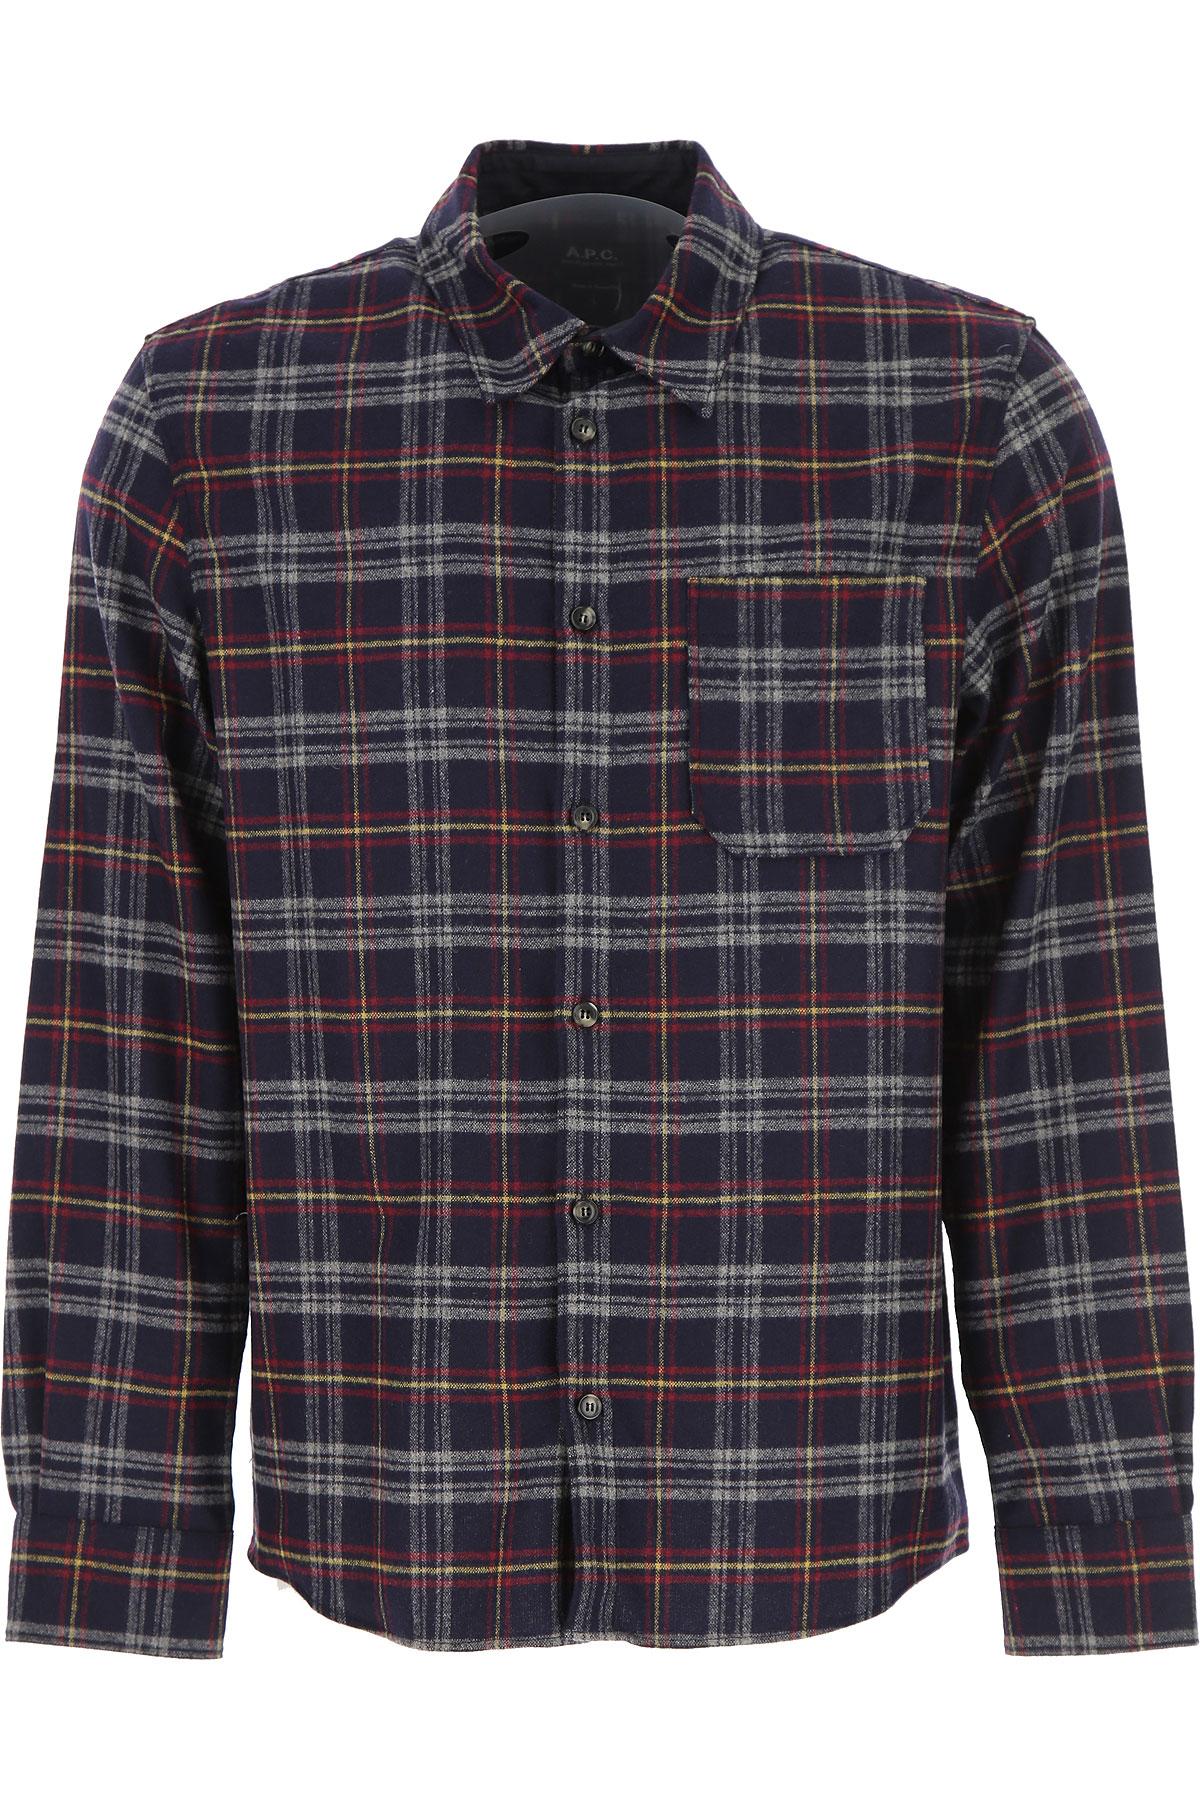 Image of A.P.C Shirt for Men, Blue Ink, Wool, 2017, L M S XL